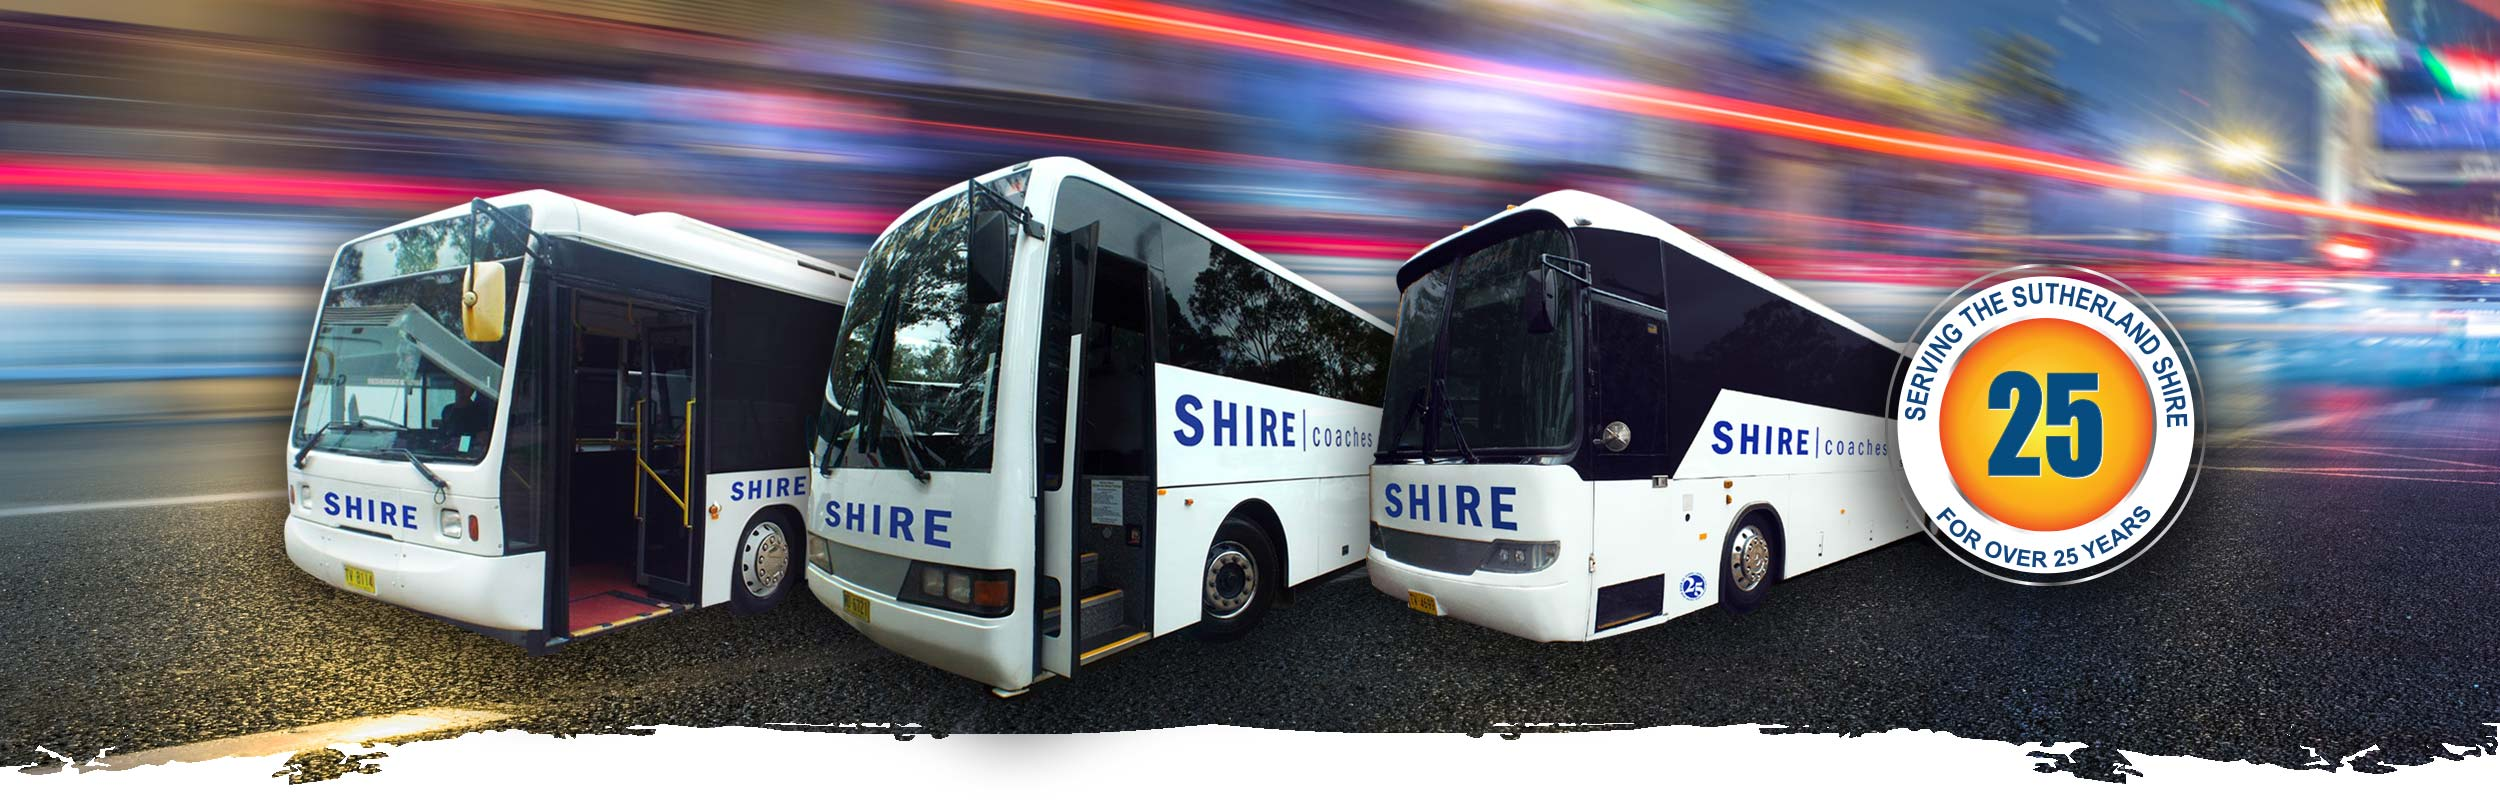 Shire Coaches image